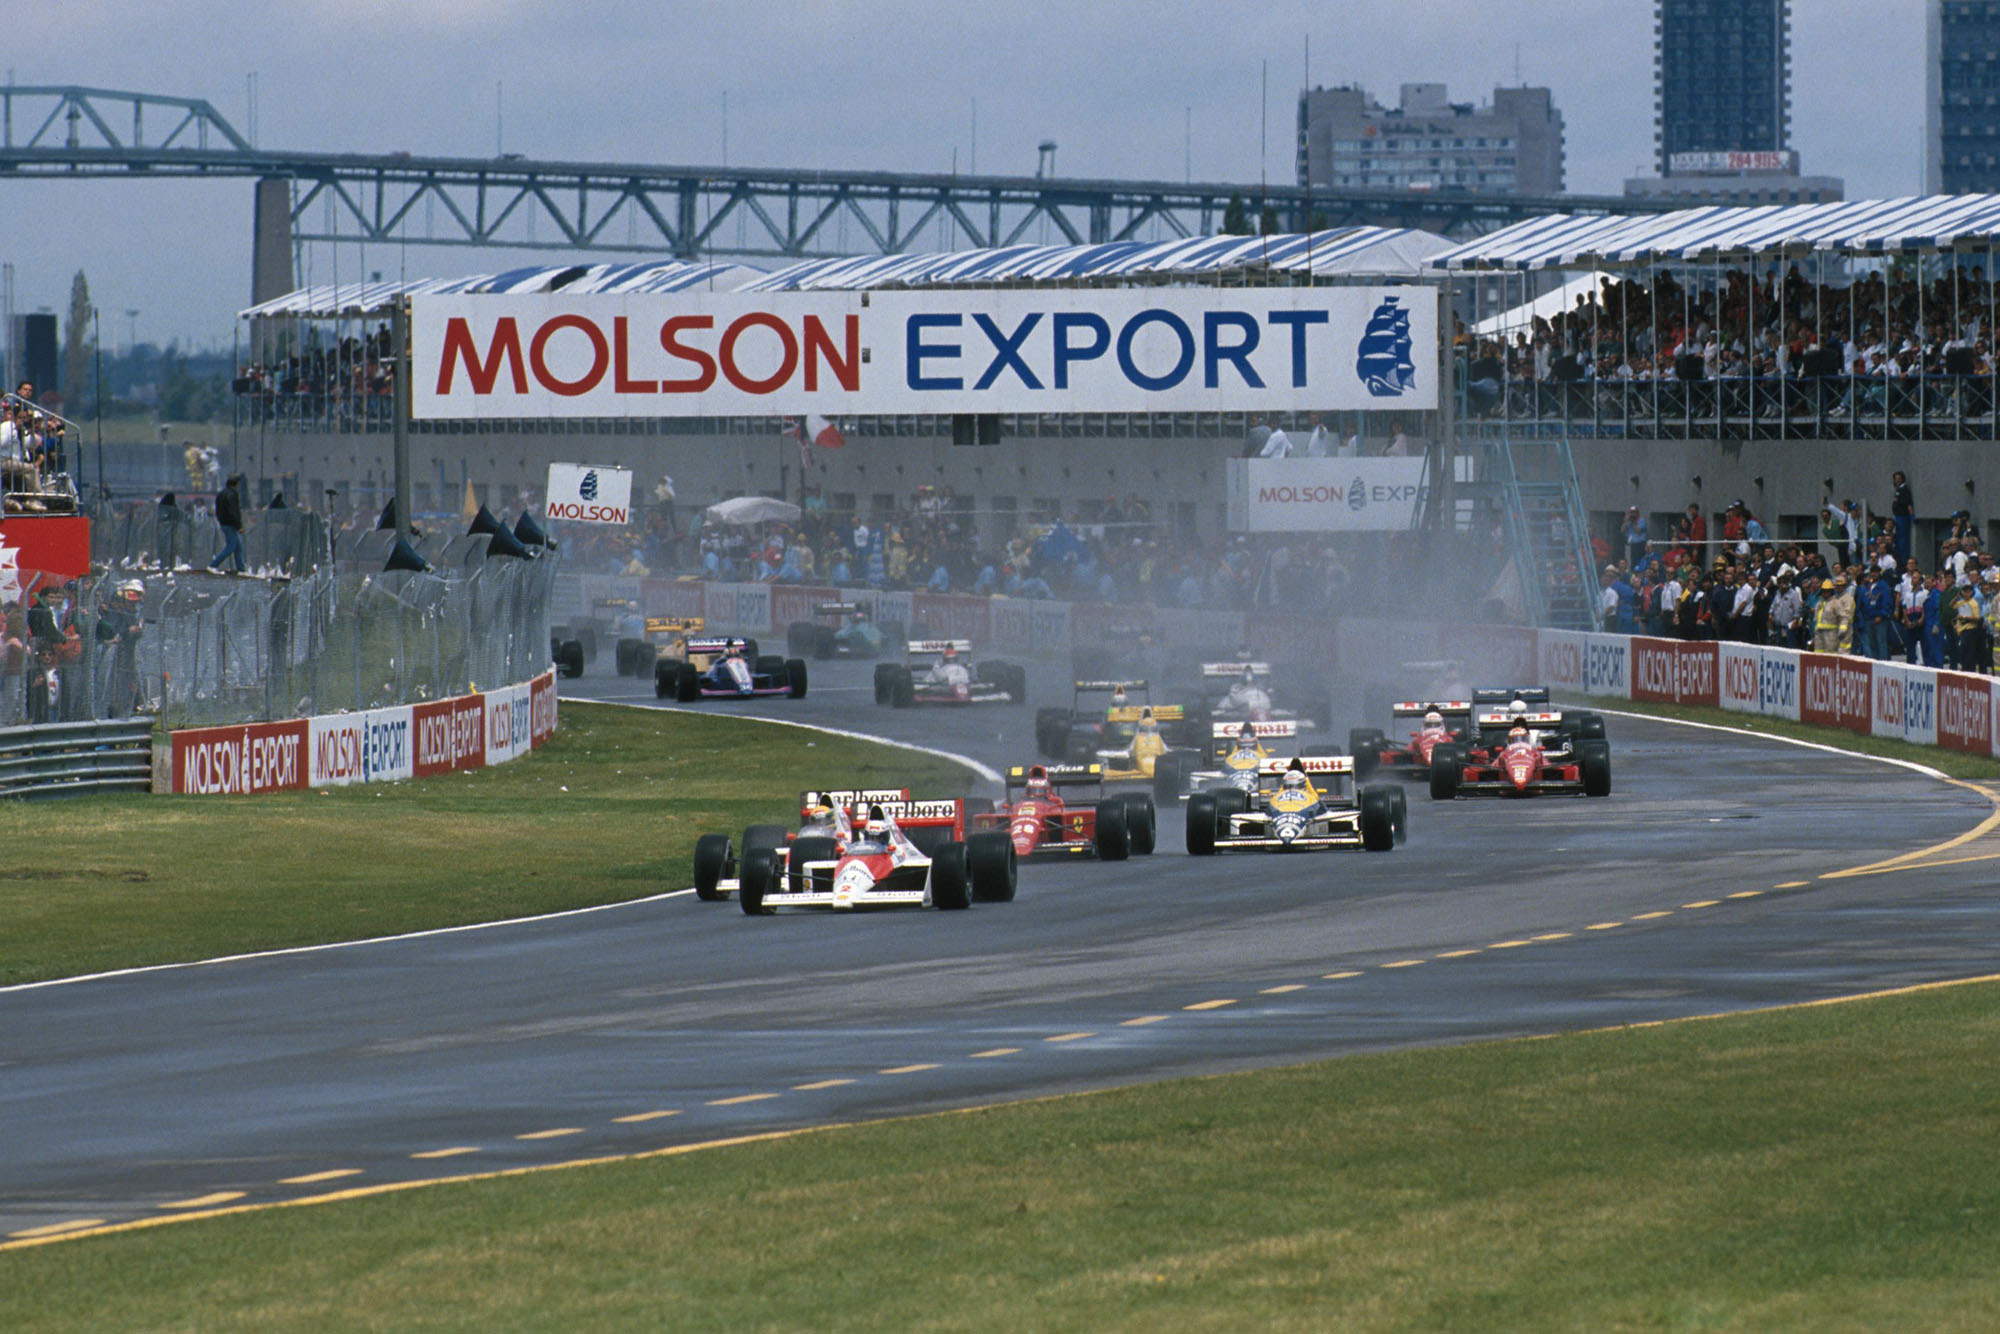 1989 CAN GP start